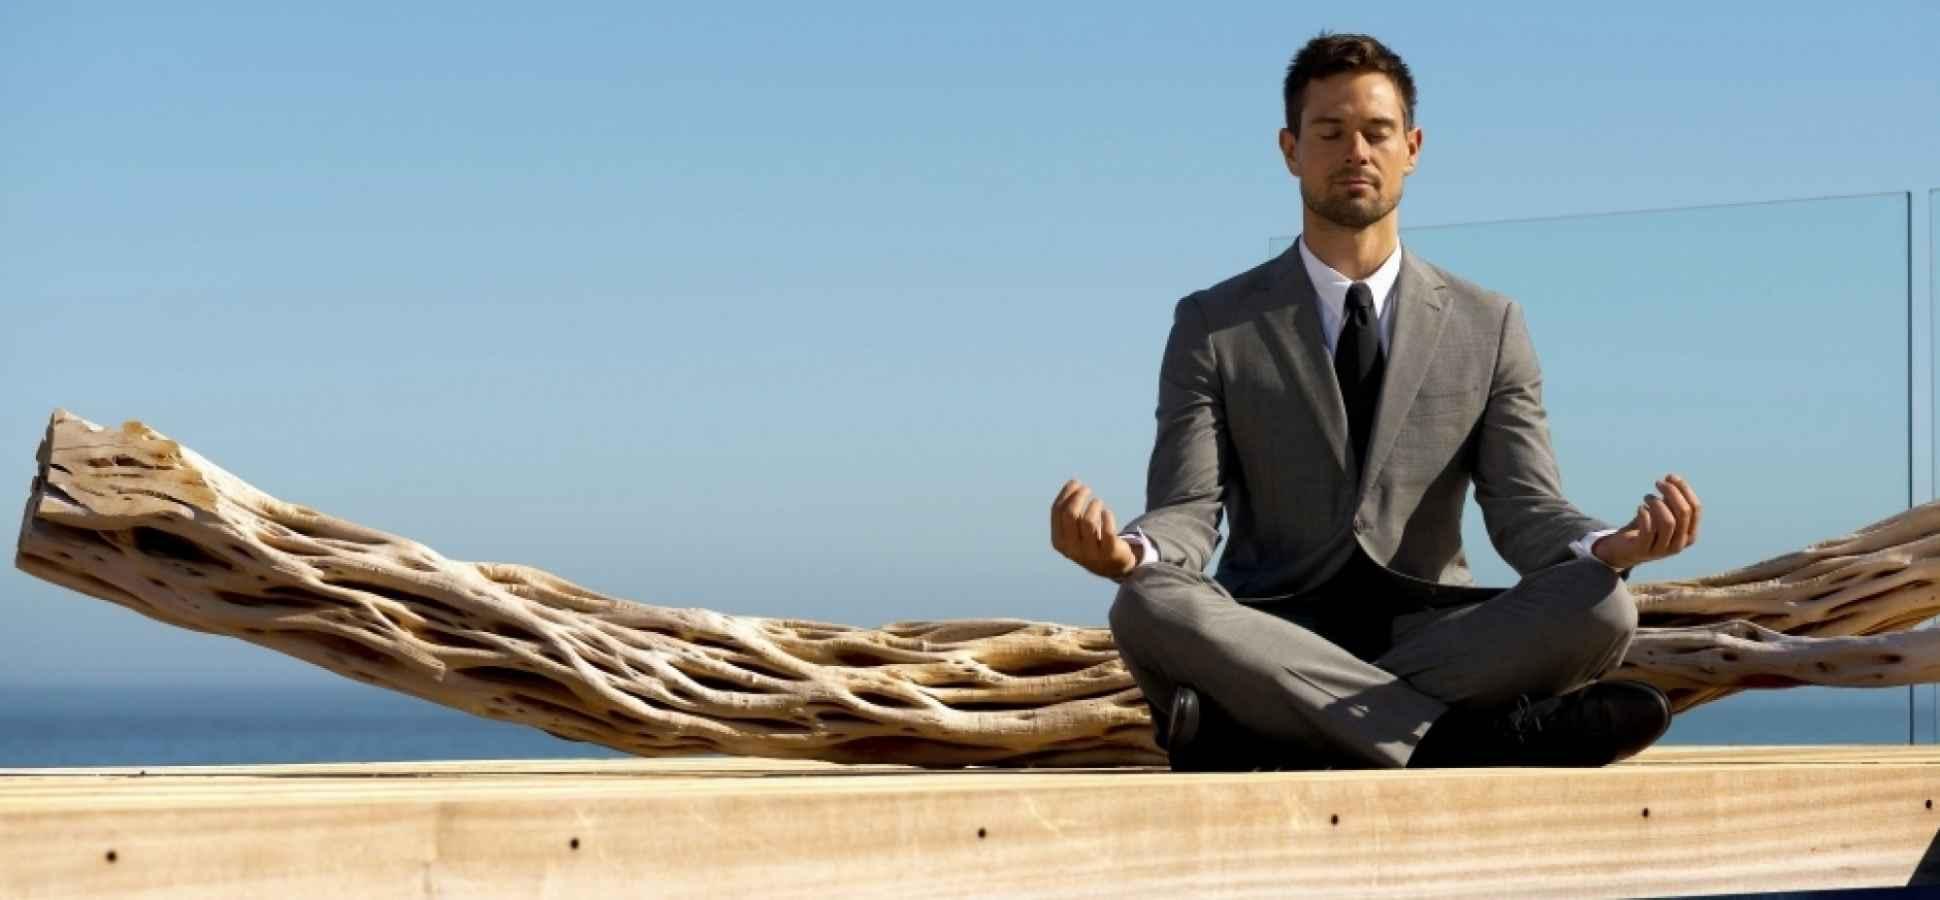 33 Ways to Encourage Mindfulness at Work